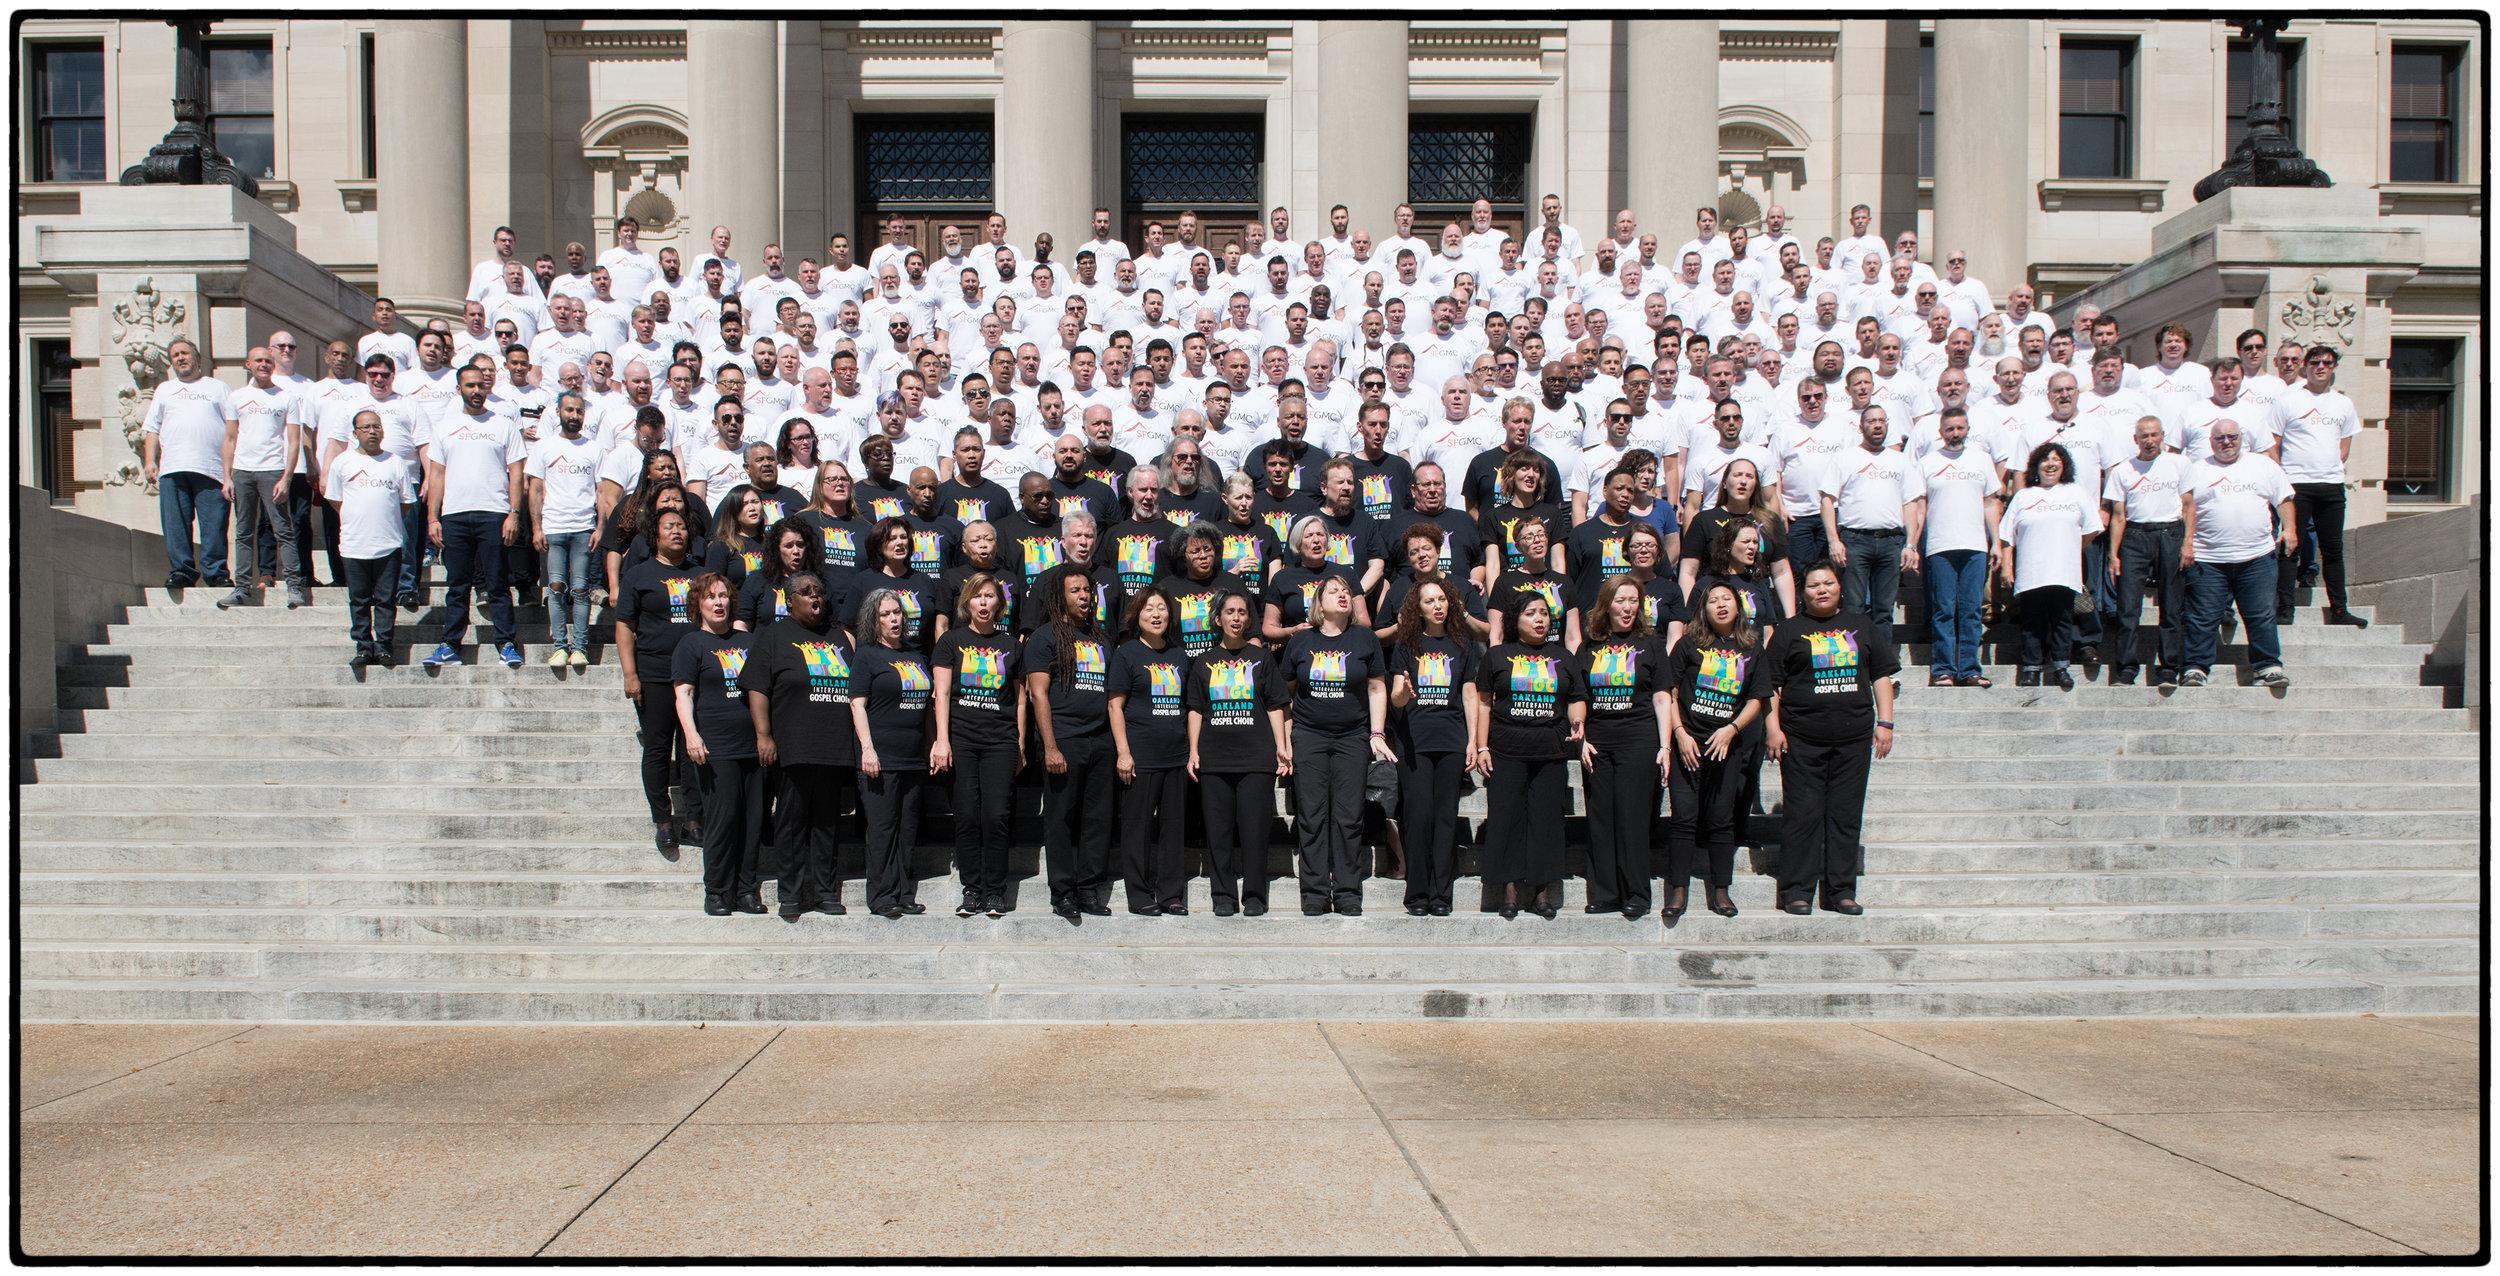 SF Gay Men's Chorus with the Oakland Interfaith Gospel Choir, Jackson, Mississippi